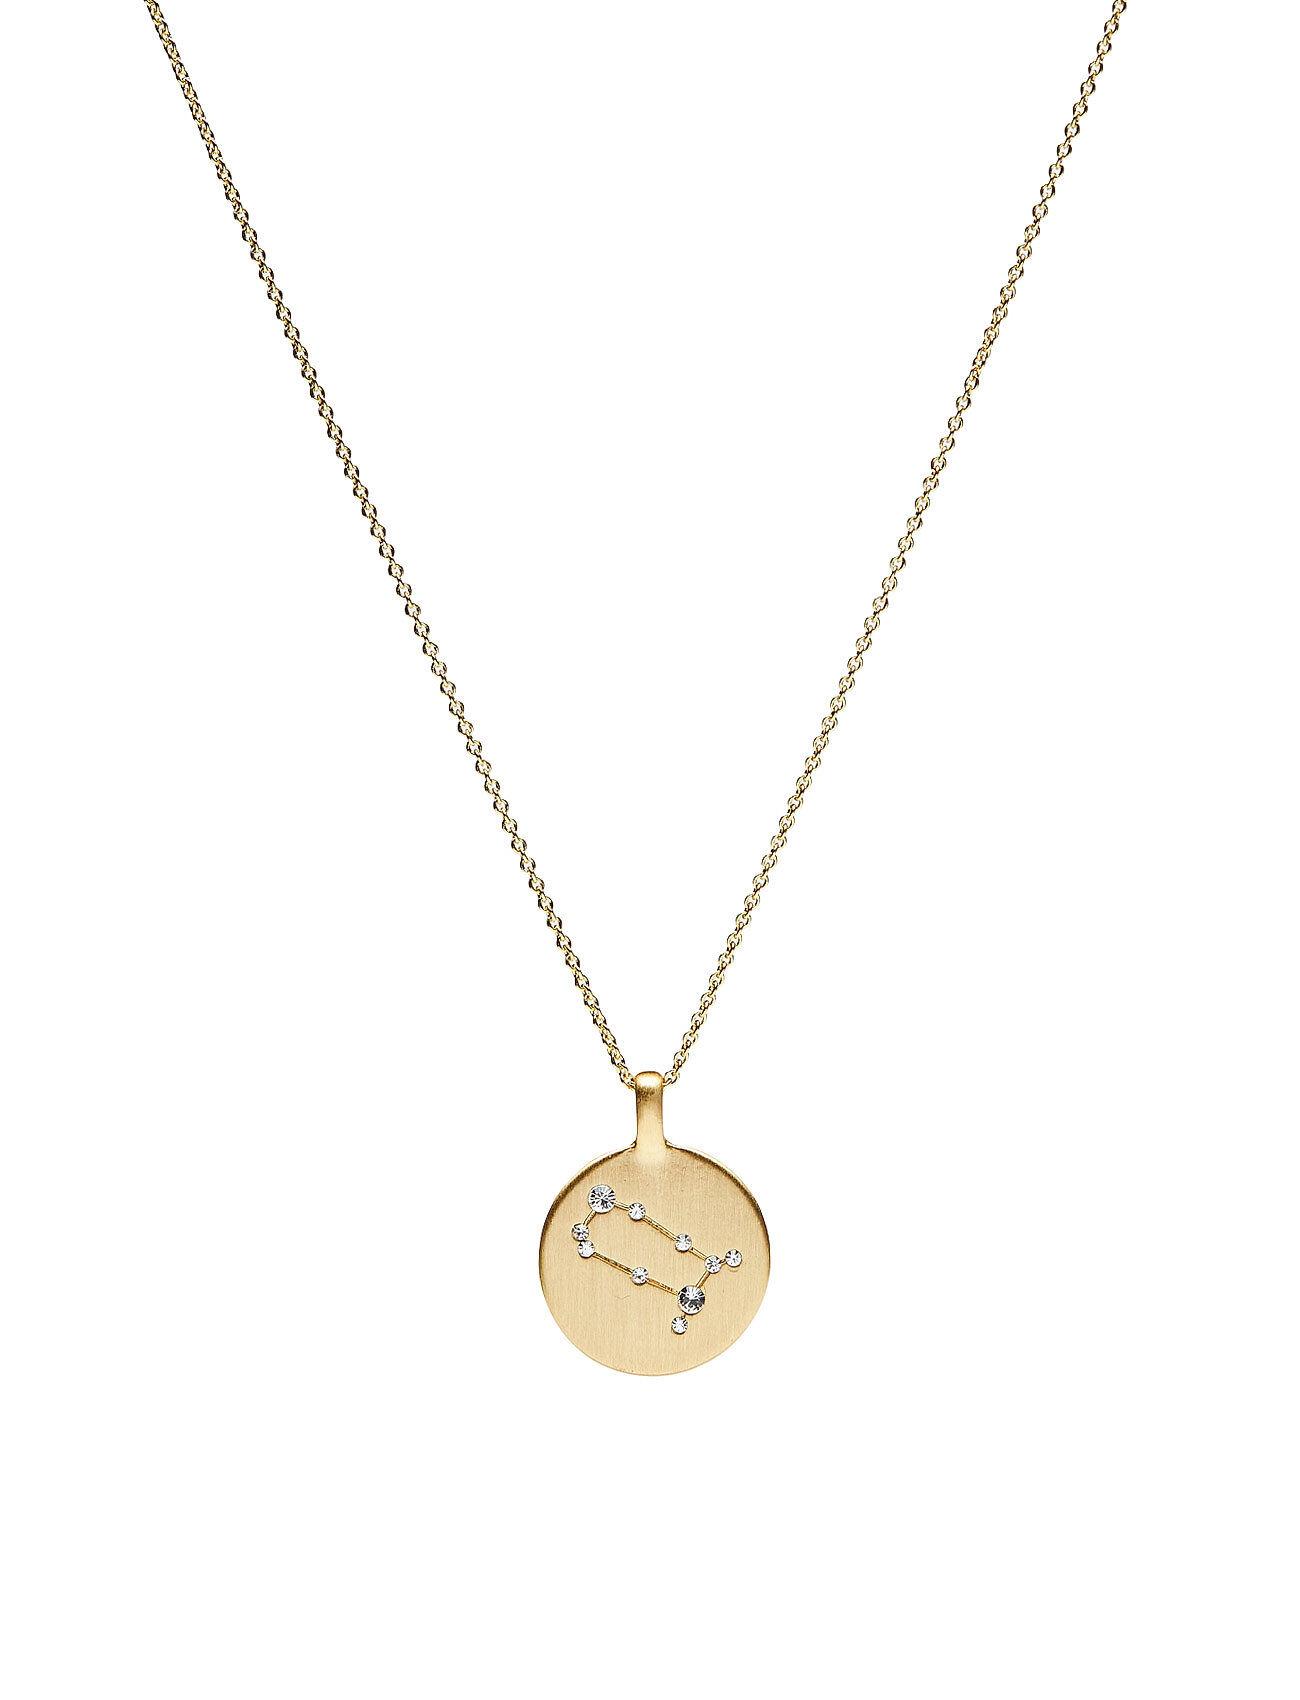 Pilgrim Gemini 22/05 - 21/06 Accessories Jewellery Necklaces Dainty Necklaces Kulta Pilgrim